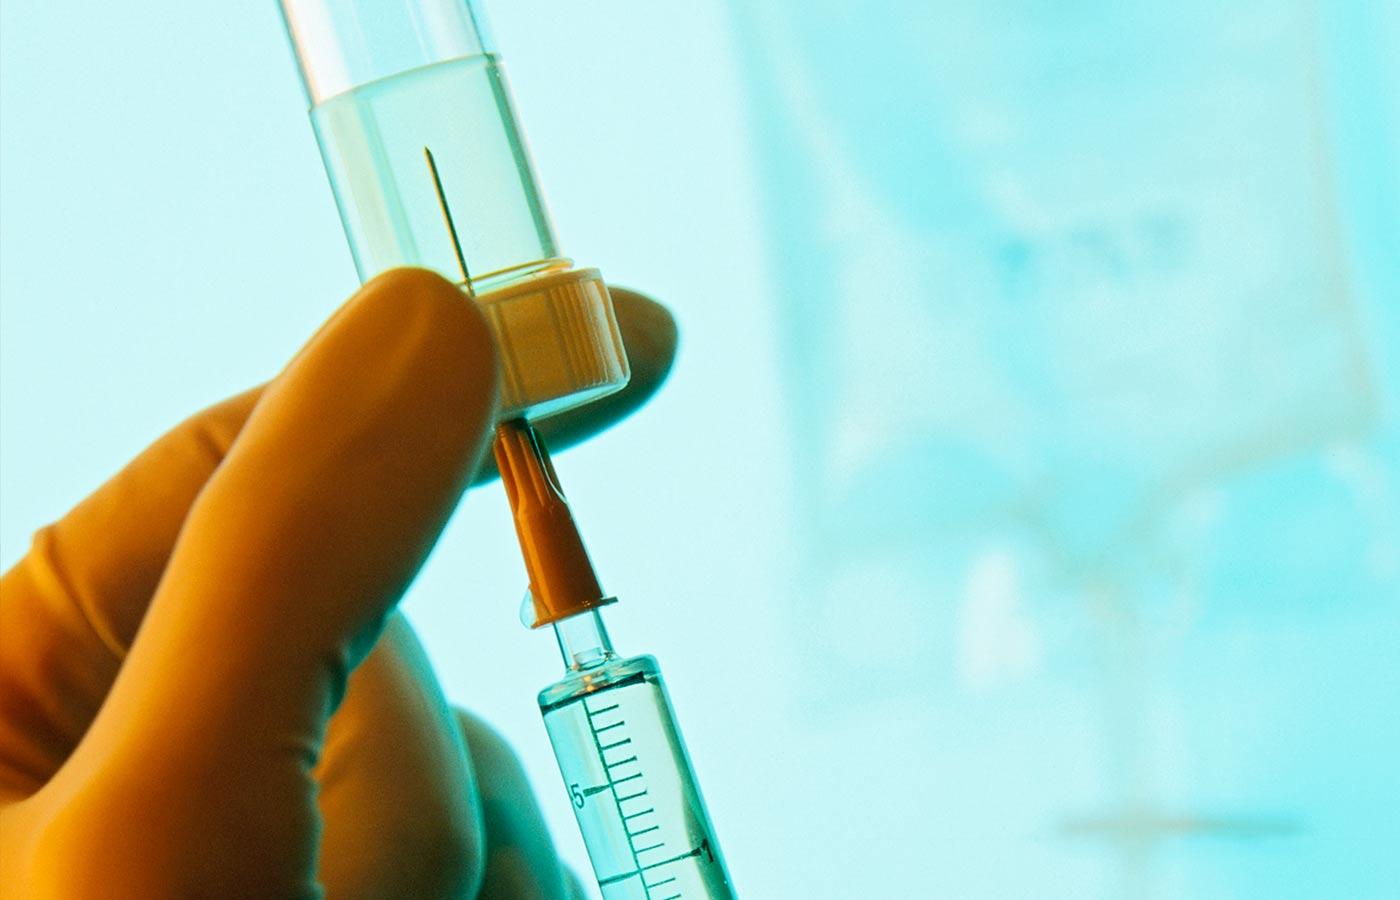 hpv impfung techniker krankenkasse